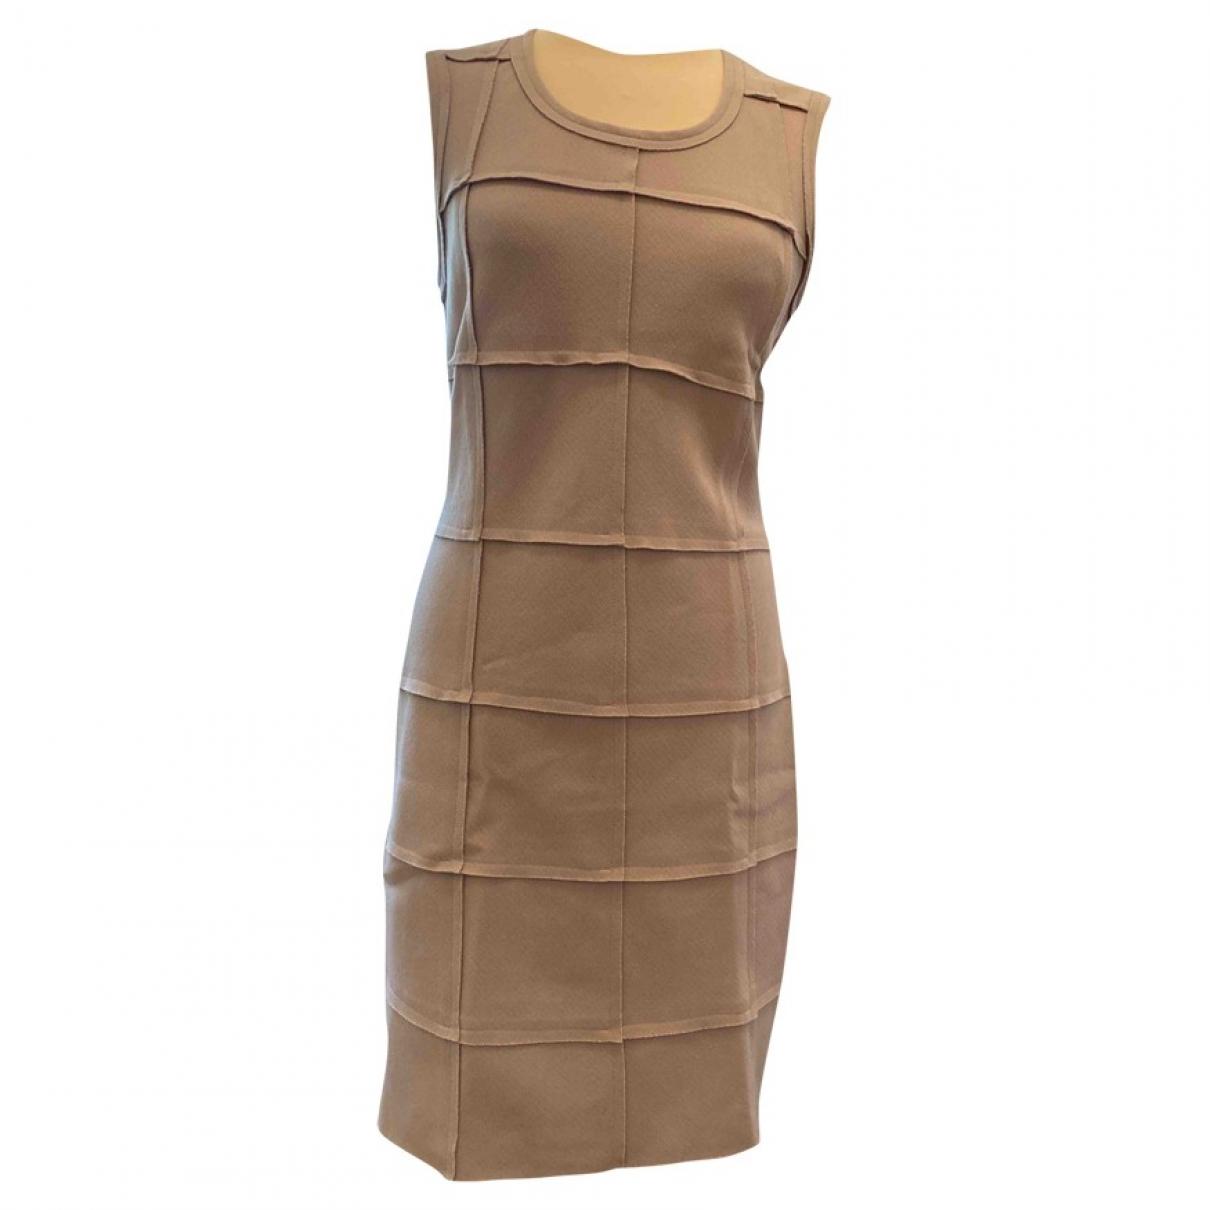 Liviana Conti \N Kleid in  Beige Synthetik